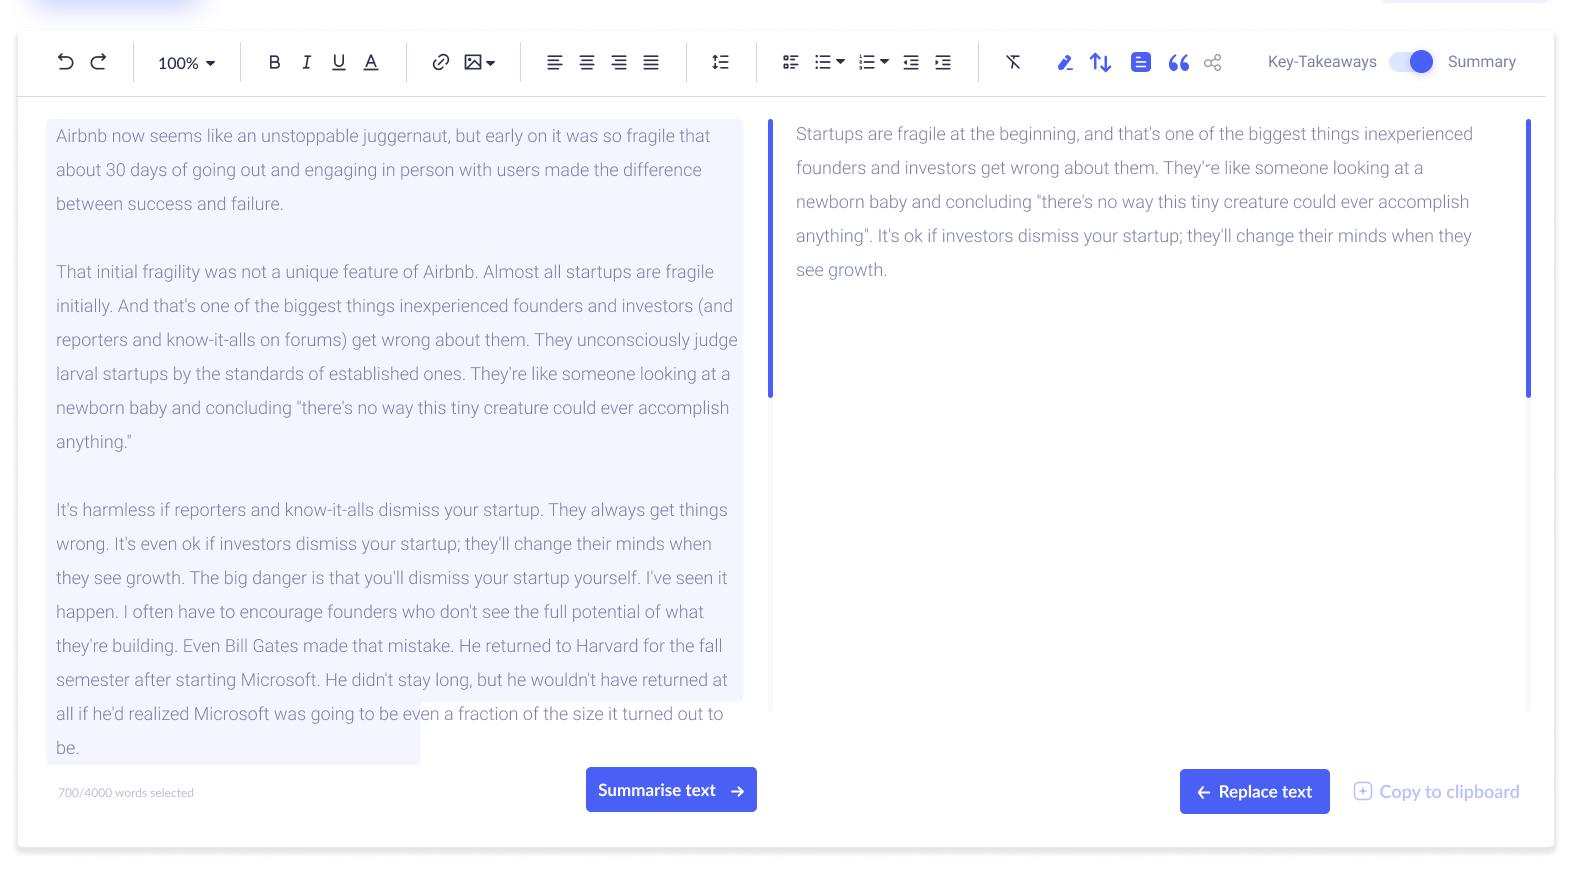 Content screen   summarise text (1)